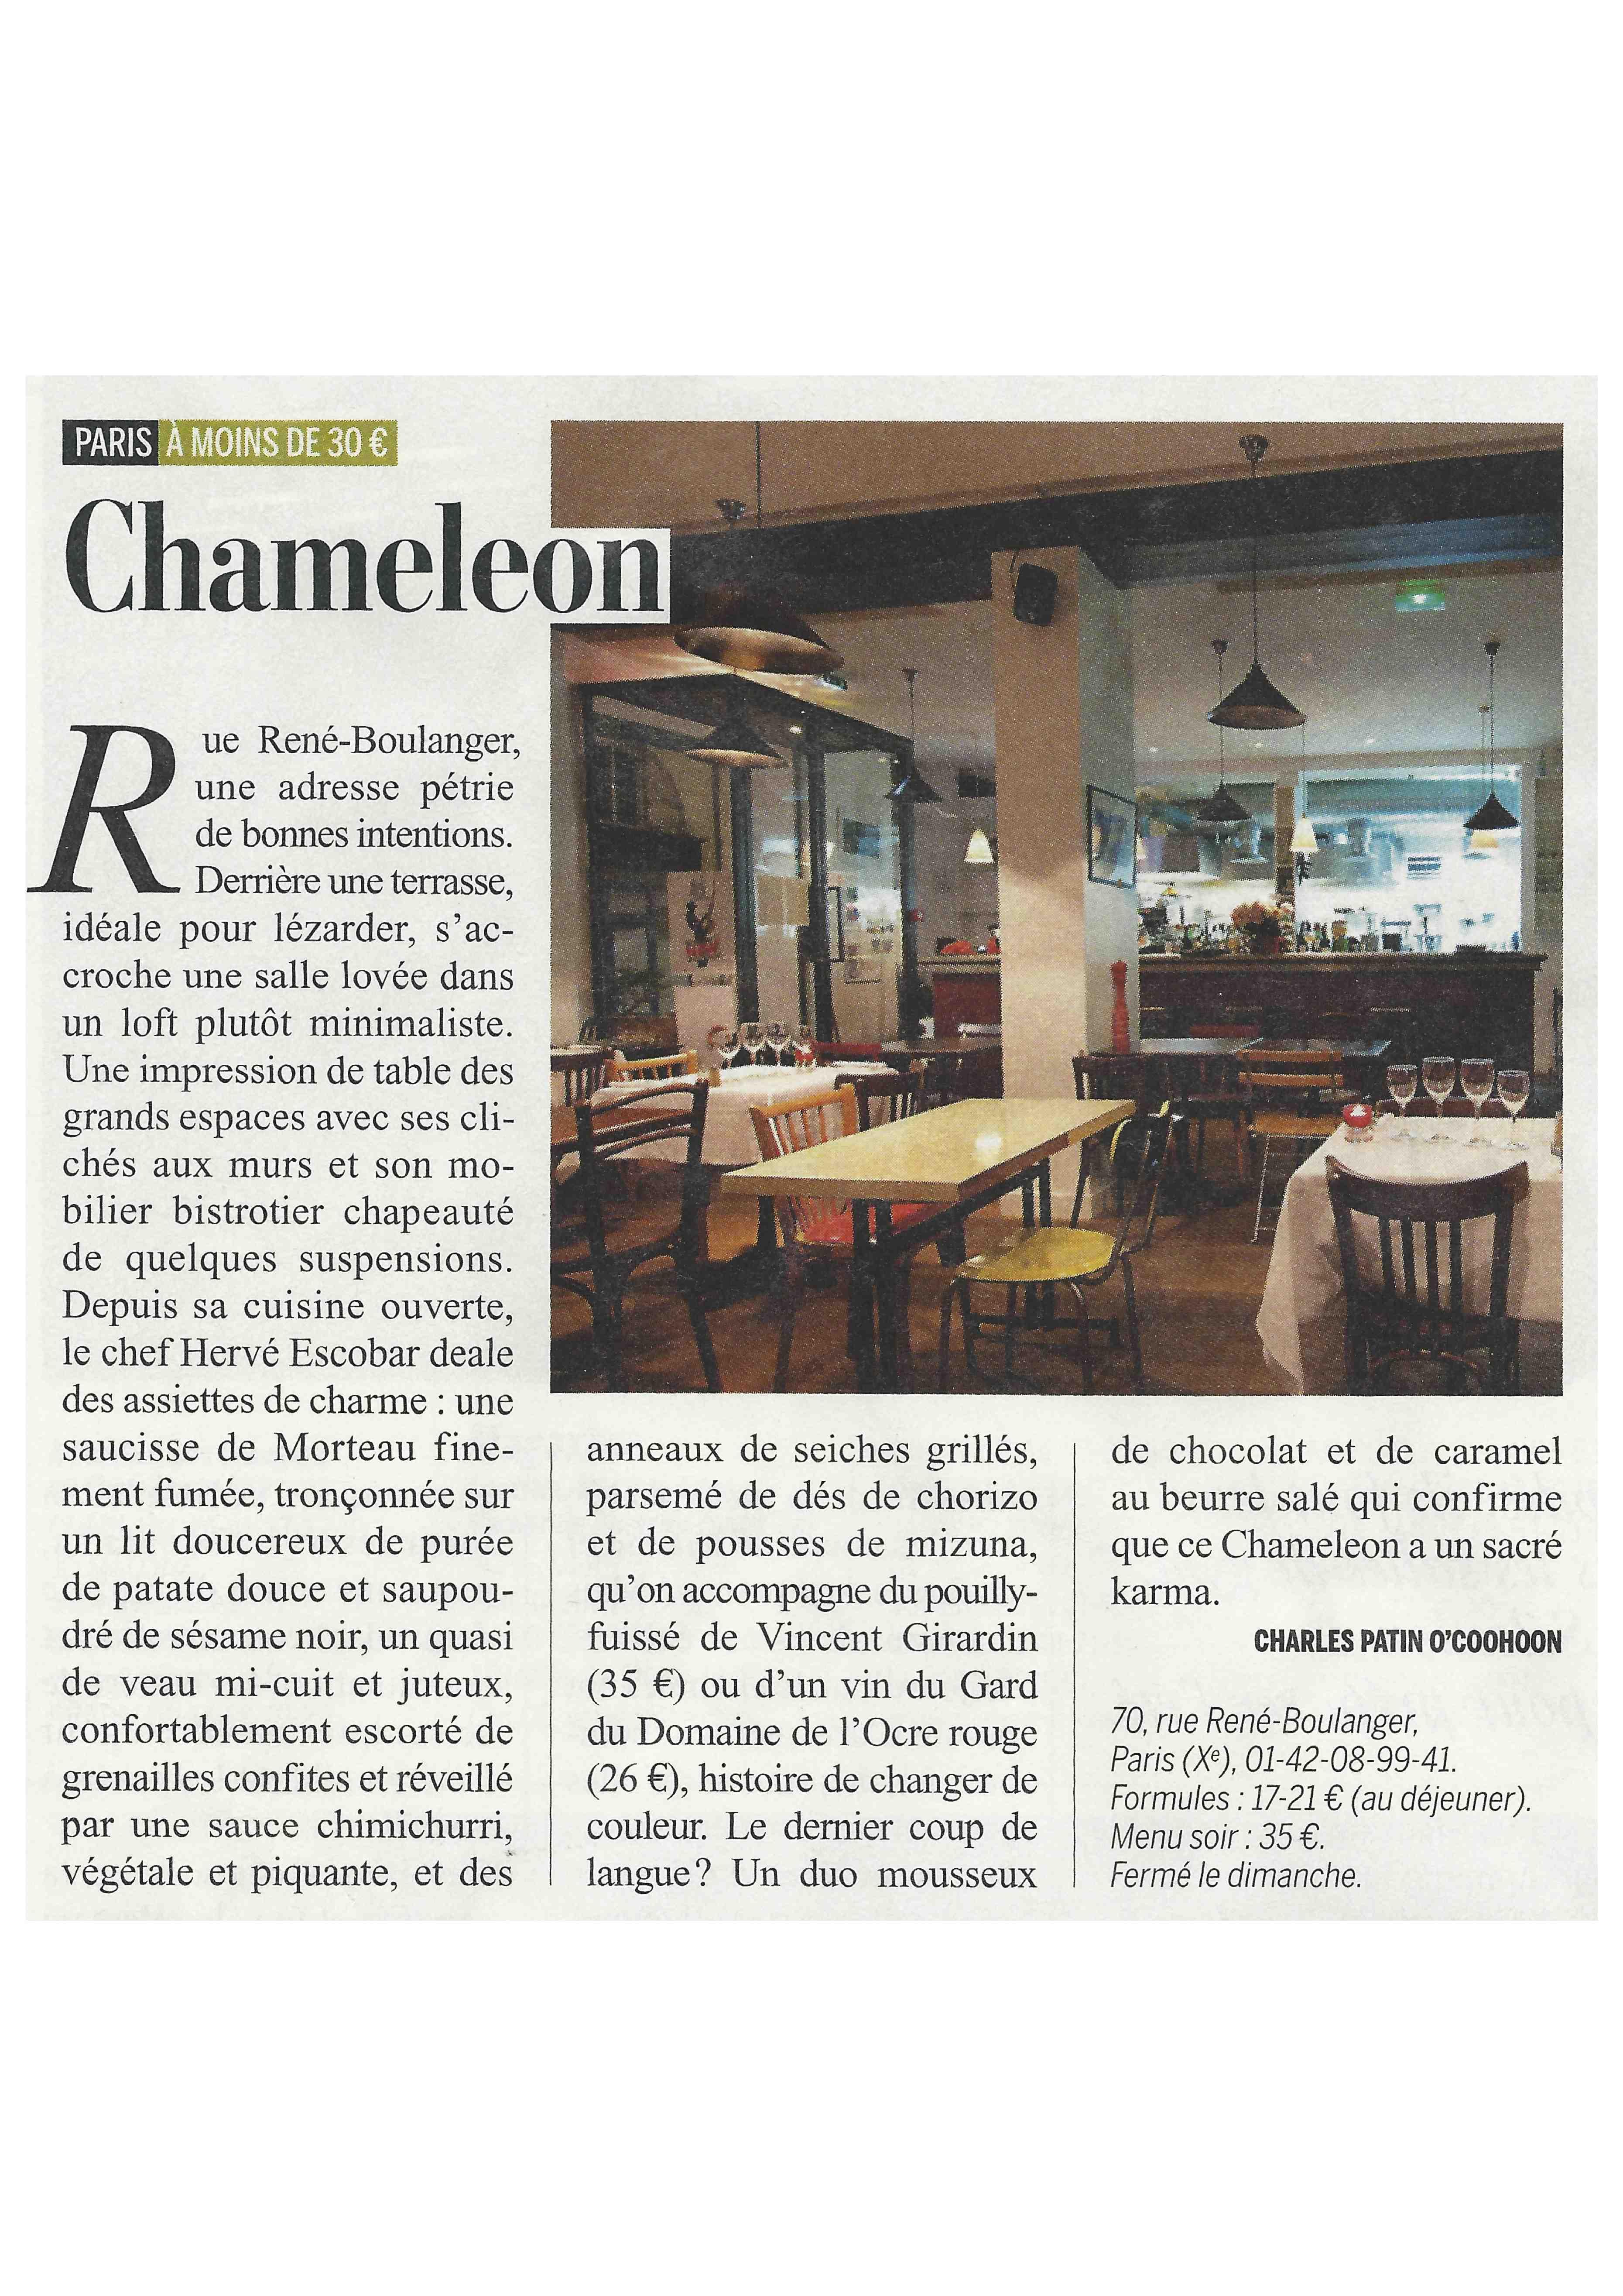 Article Express Style sur Chameleon Restaurant le 4 juin 2014, par Charles Patin O'Coohoon